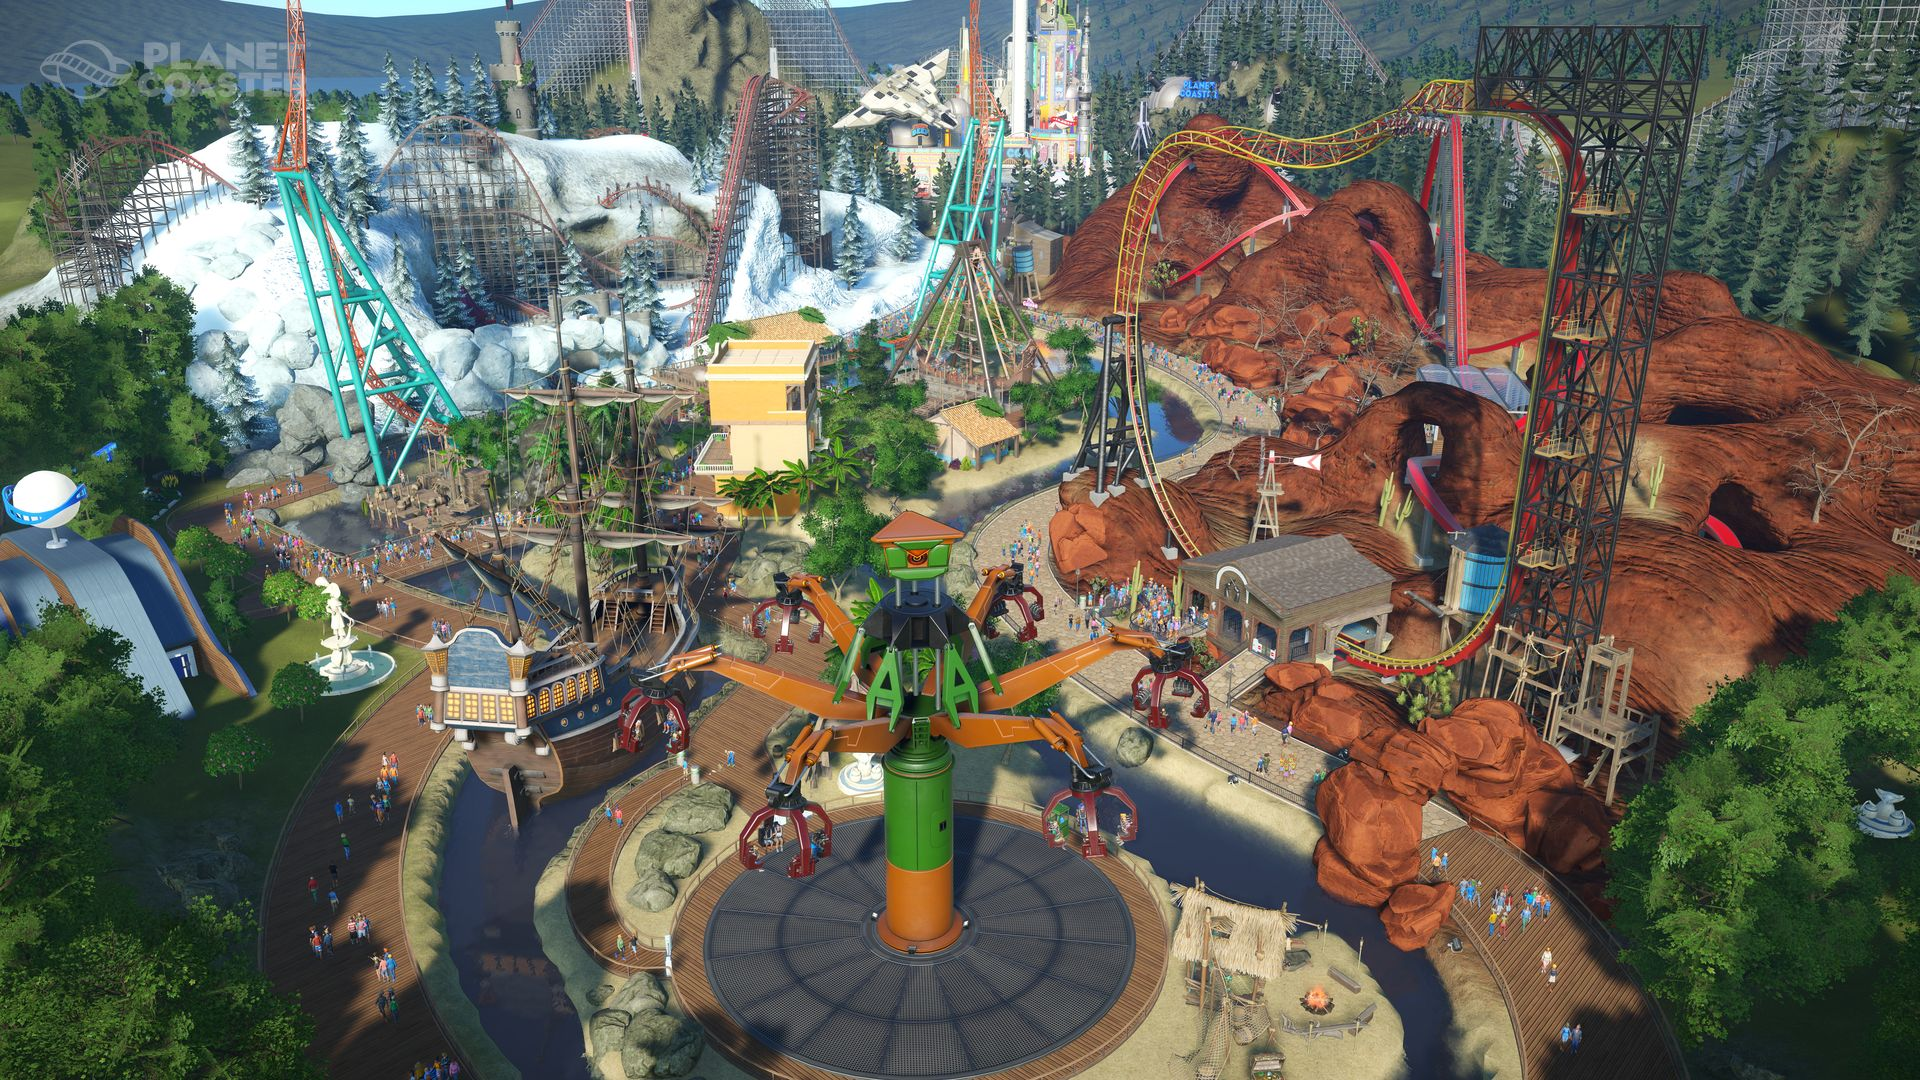 Planet Coaster - Cedar Points Steel Vengeance image 2